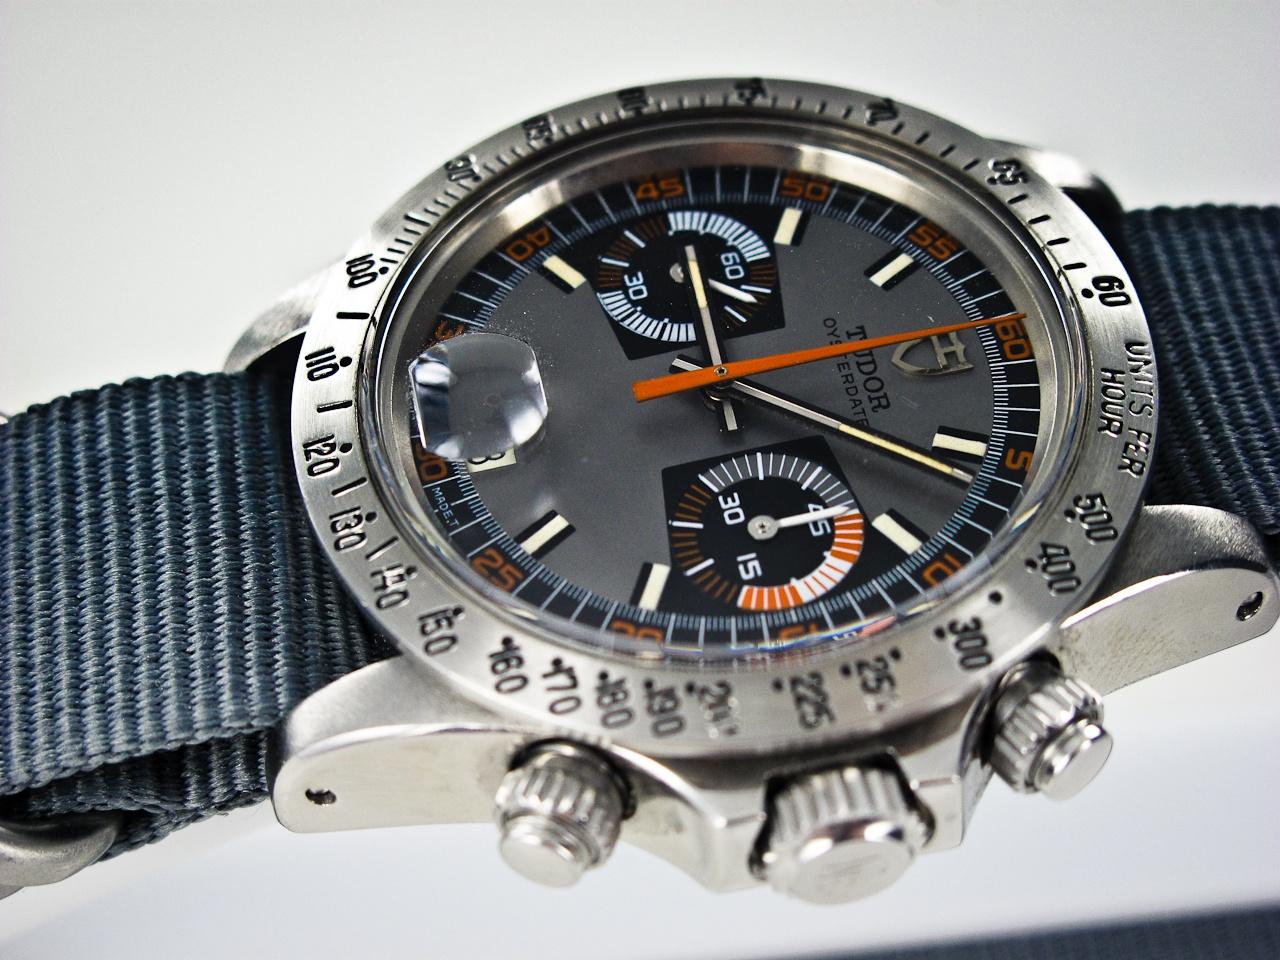 2 chrono qui flash ^^ vos avis svp  Rolex_image.2573868